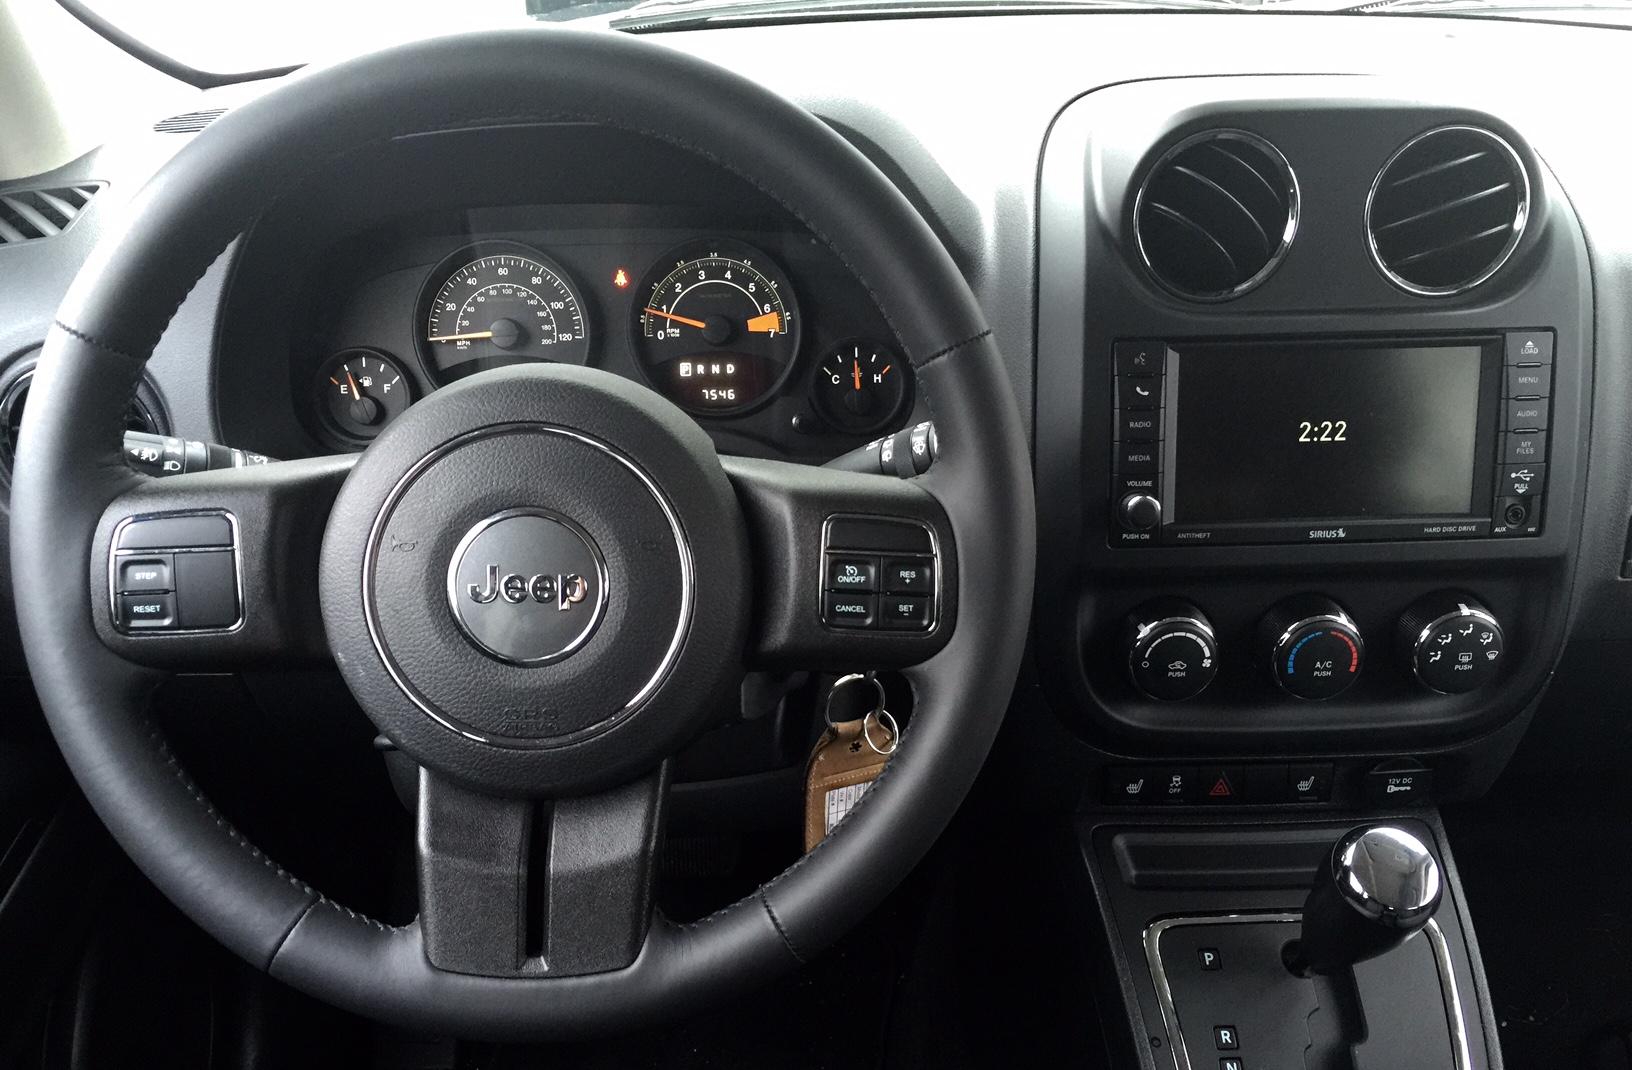 2014 Jeep Patriot Dashboard